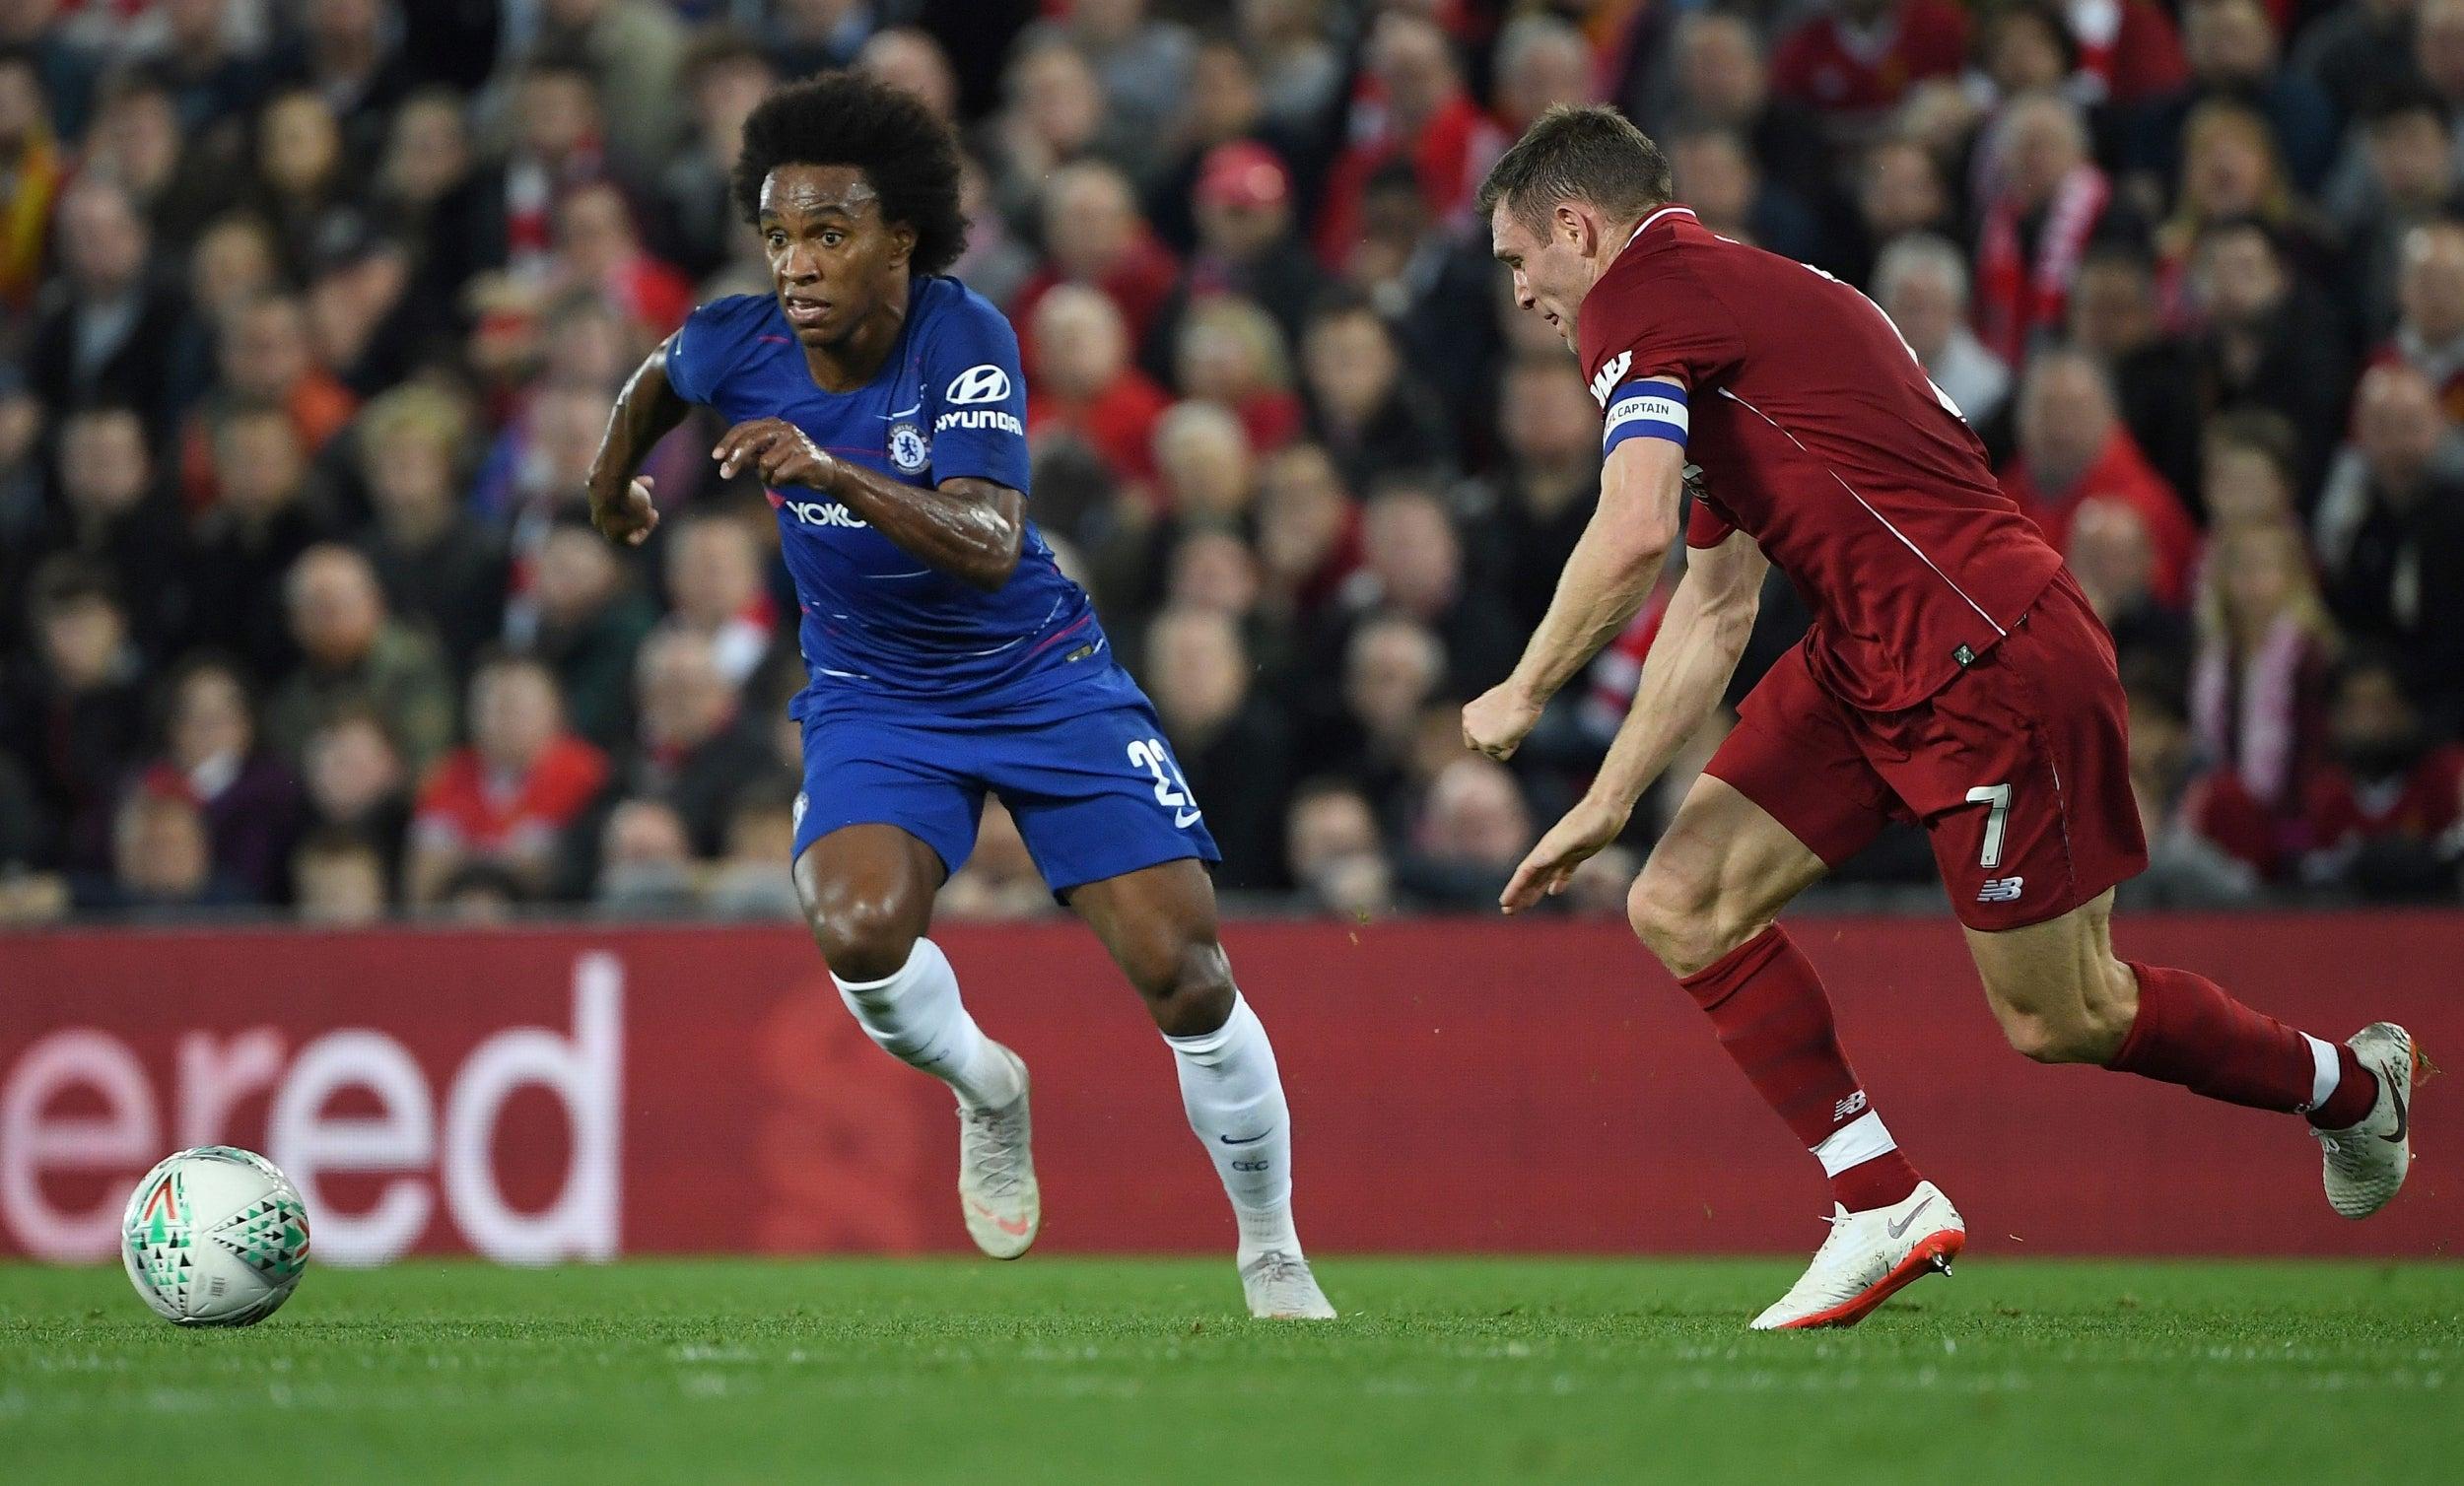 Chelsea vs Liverpool - as it happened: Daniel Sturridge scores late